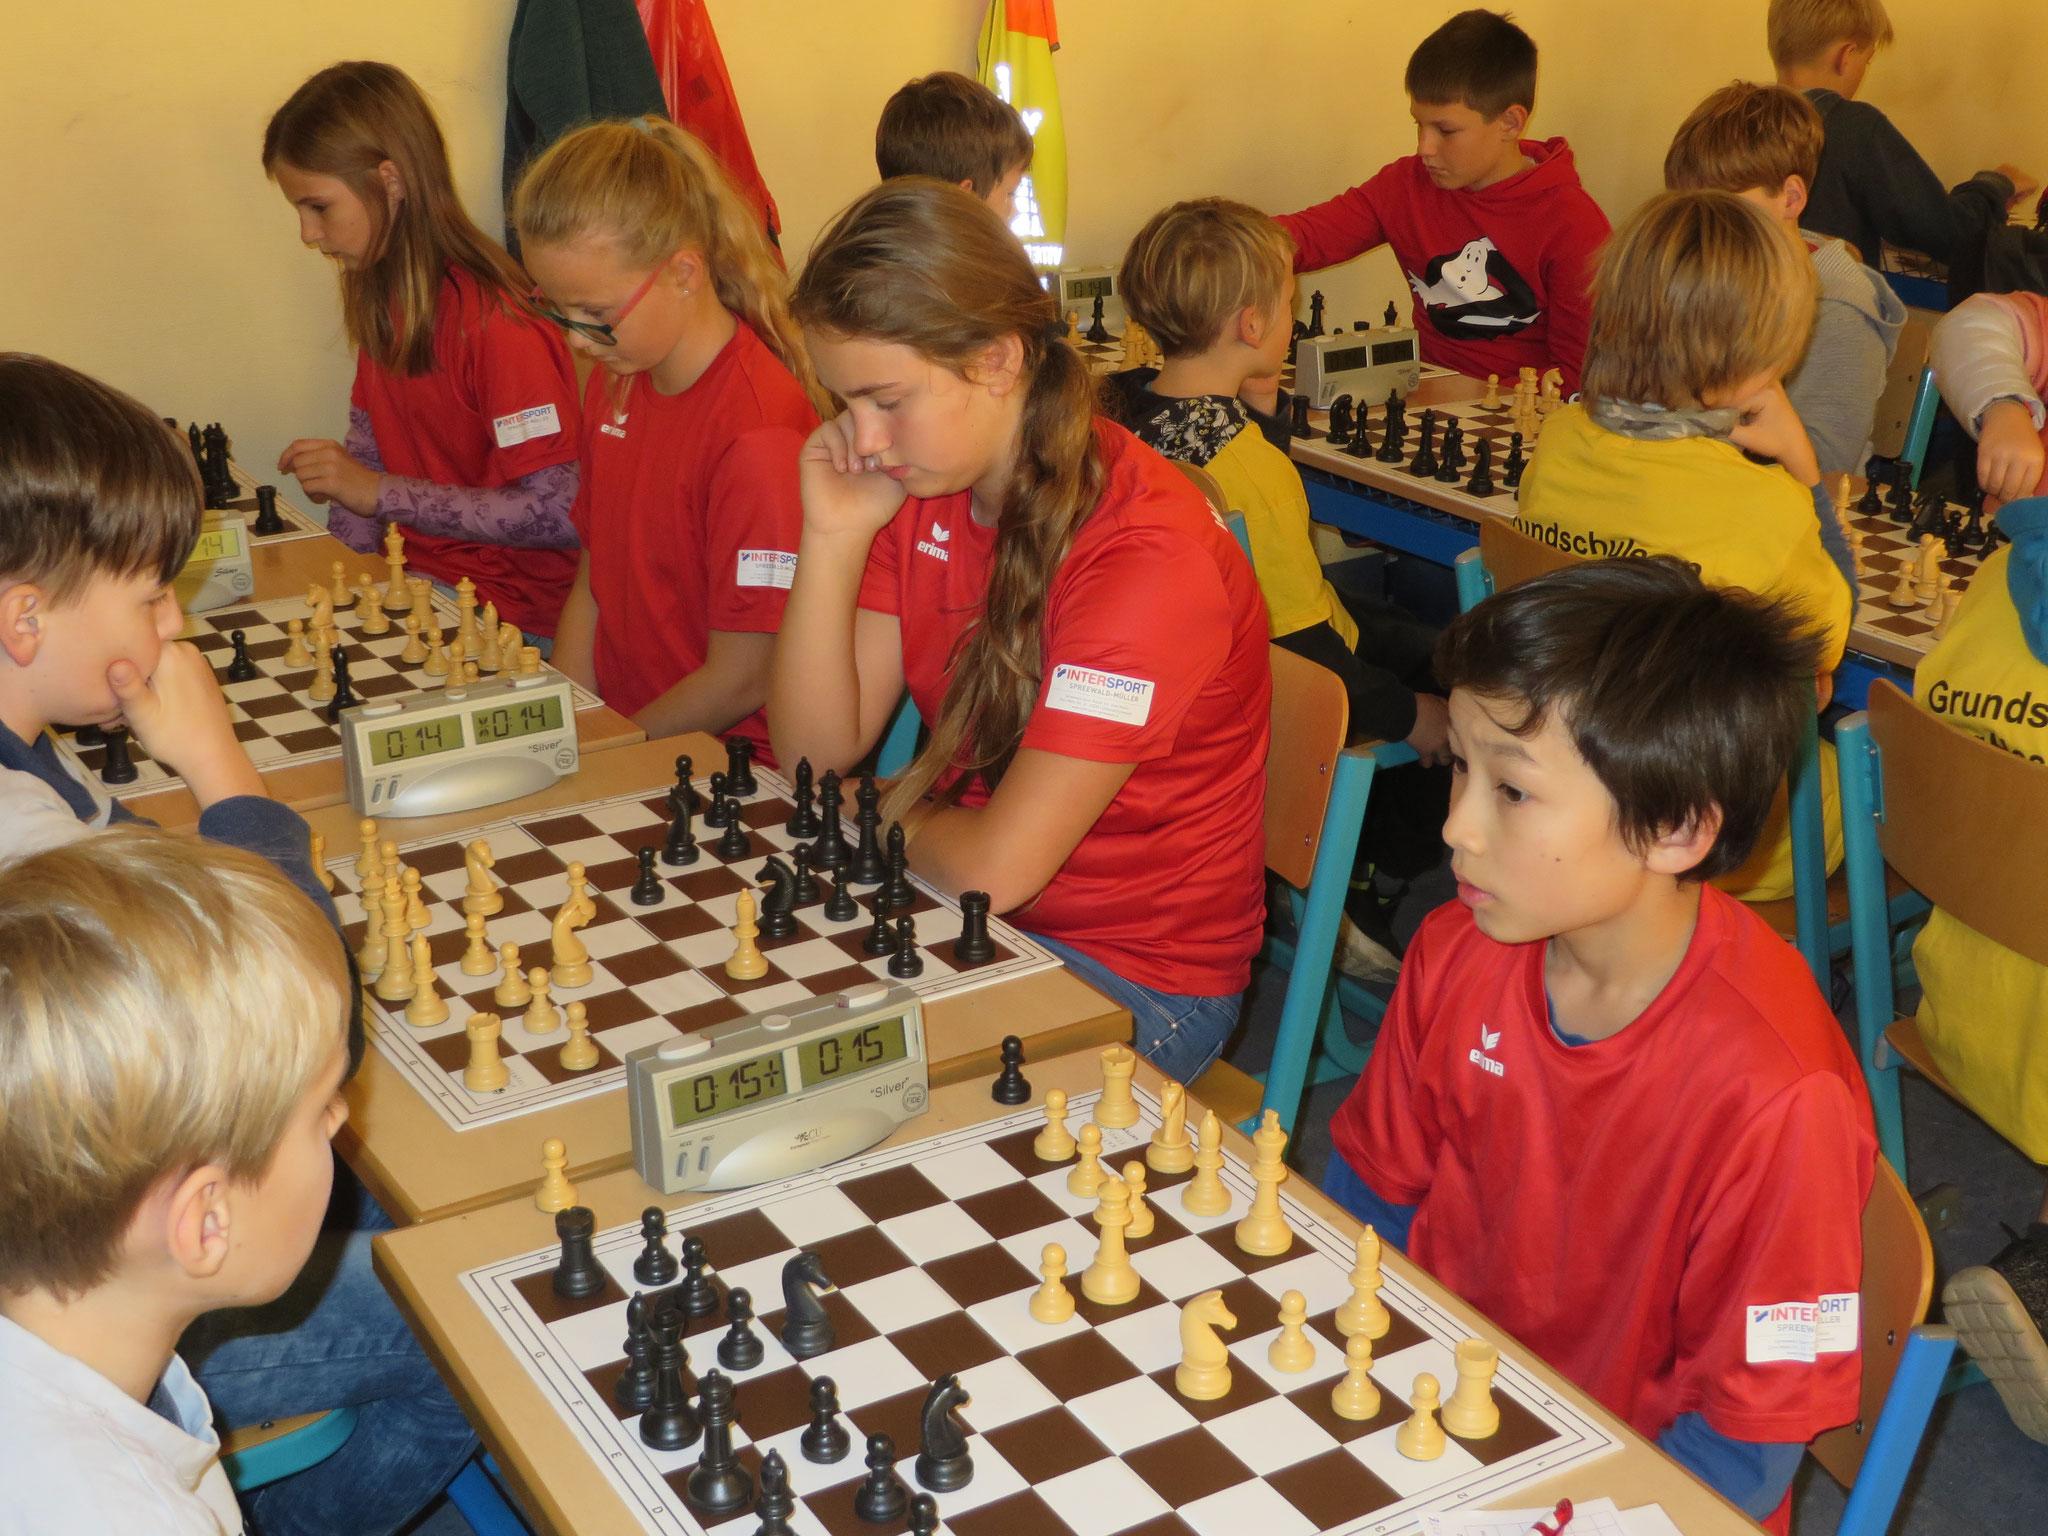 AK 2 : Das Team der Werner-Seelenbinder-GS I in Runde 3 mit Henry (Brett 1) , Aleksandra (Brett 2) , Anna (Brett 3) und Marie (Brett 4)